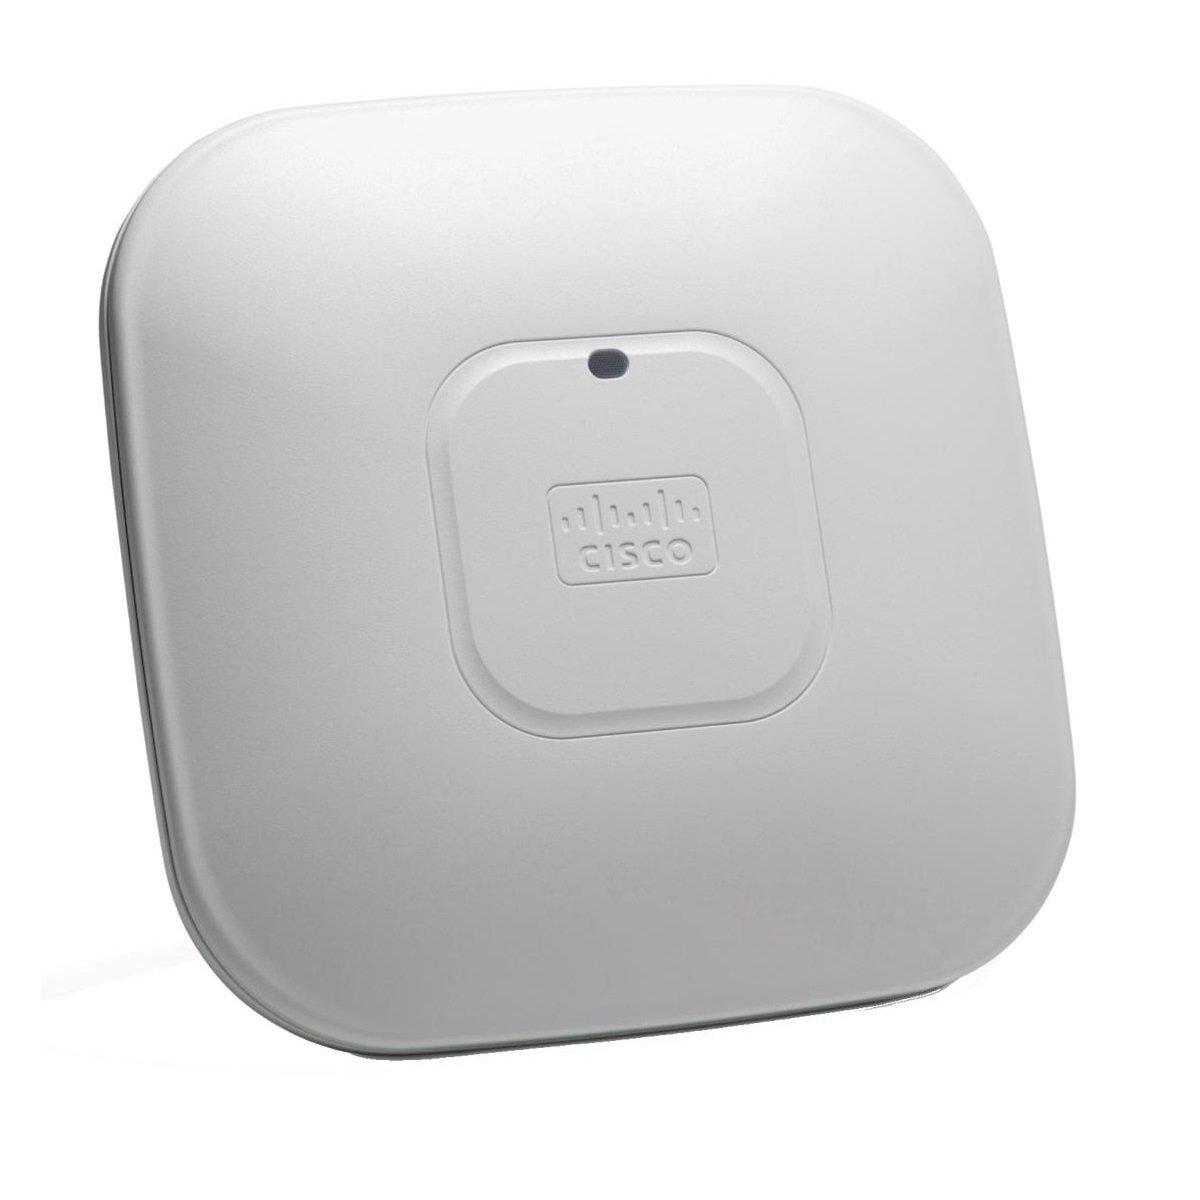 Cisco Wireless Networking (AIR-CAP2602I-A-K9)